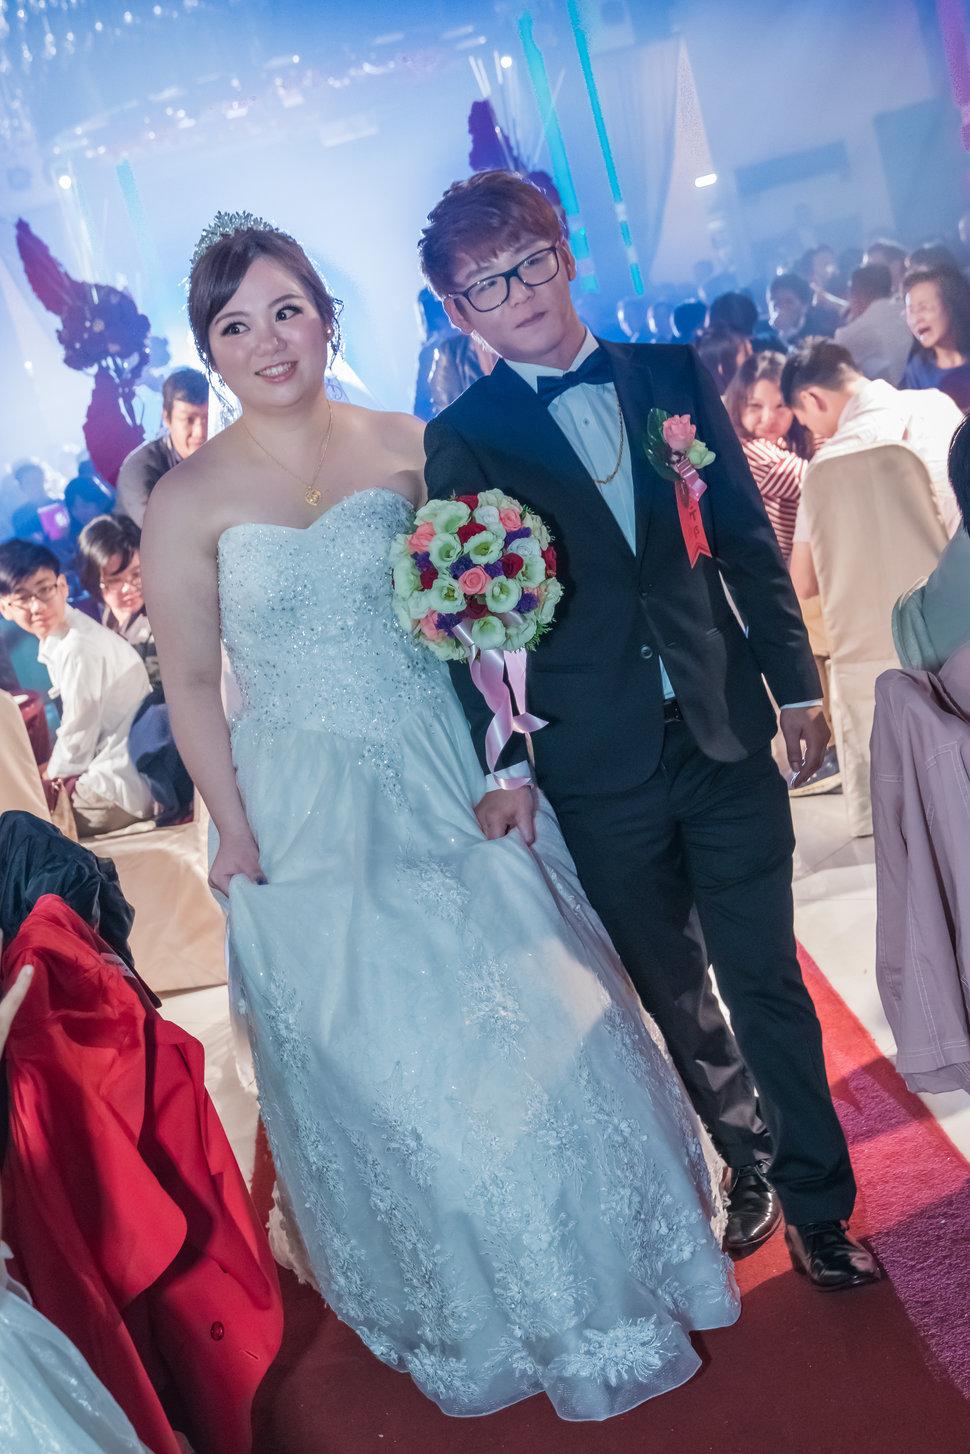 5D4_5491 - Promaker婚禮紀錄攝影團隊婚攝豪哥《結婚吧》